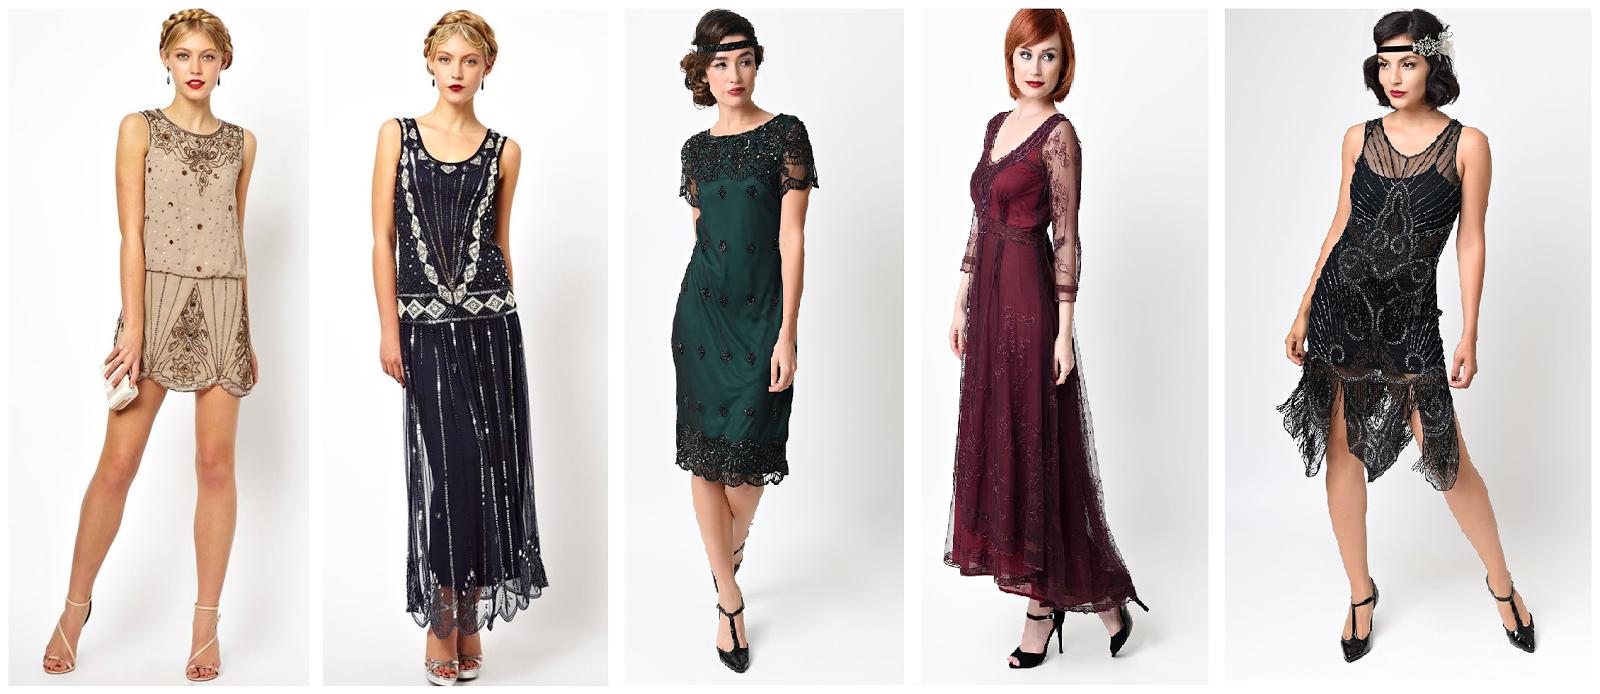 robes de mode acheter robe longue annee 20. Black Bedroom Furniture Sets. Home Design Ideas